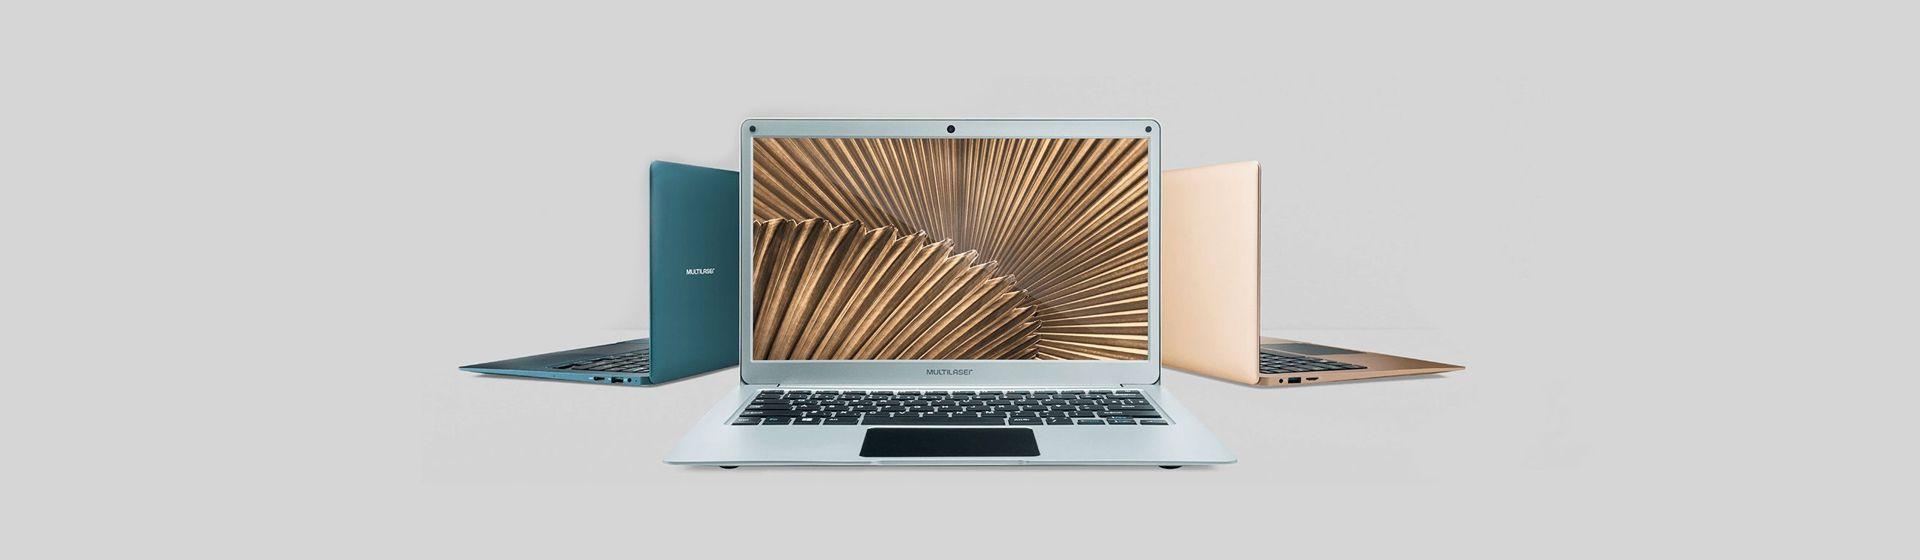 Notebook Multilaser Legacy Air é bom? Analisamos o modelo PC207